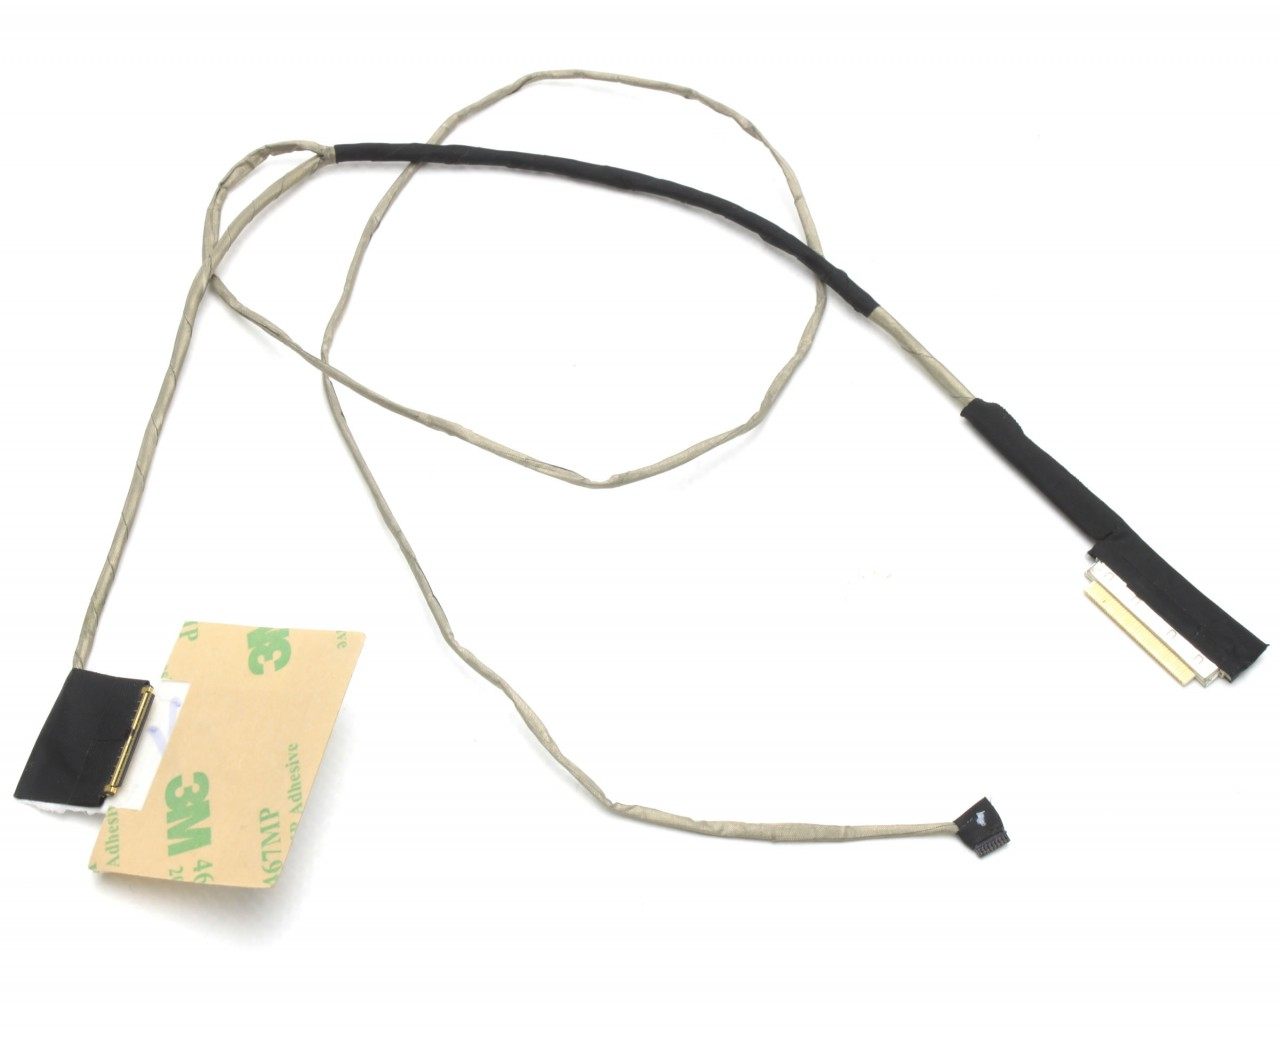 Cablu video LVDS Lenovo DC02001XO00 Full HD imagine powerlaptop.ro 2021